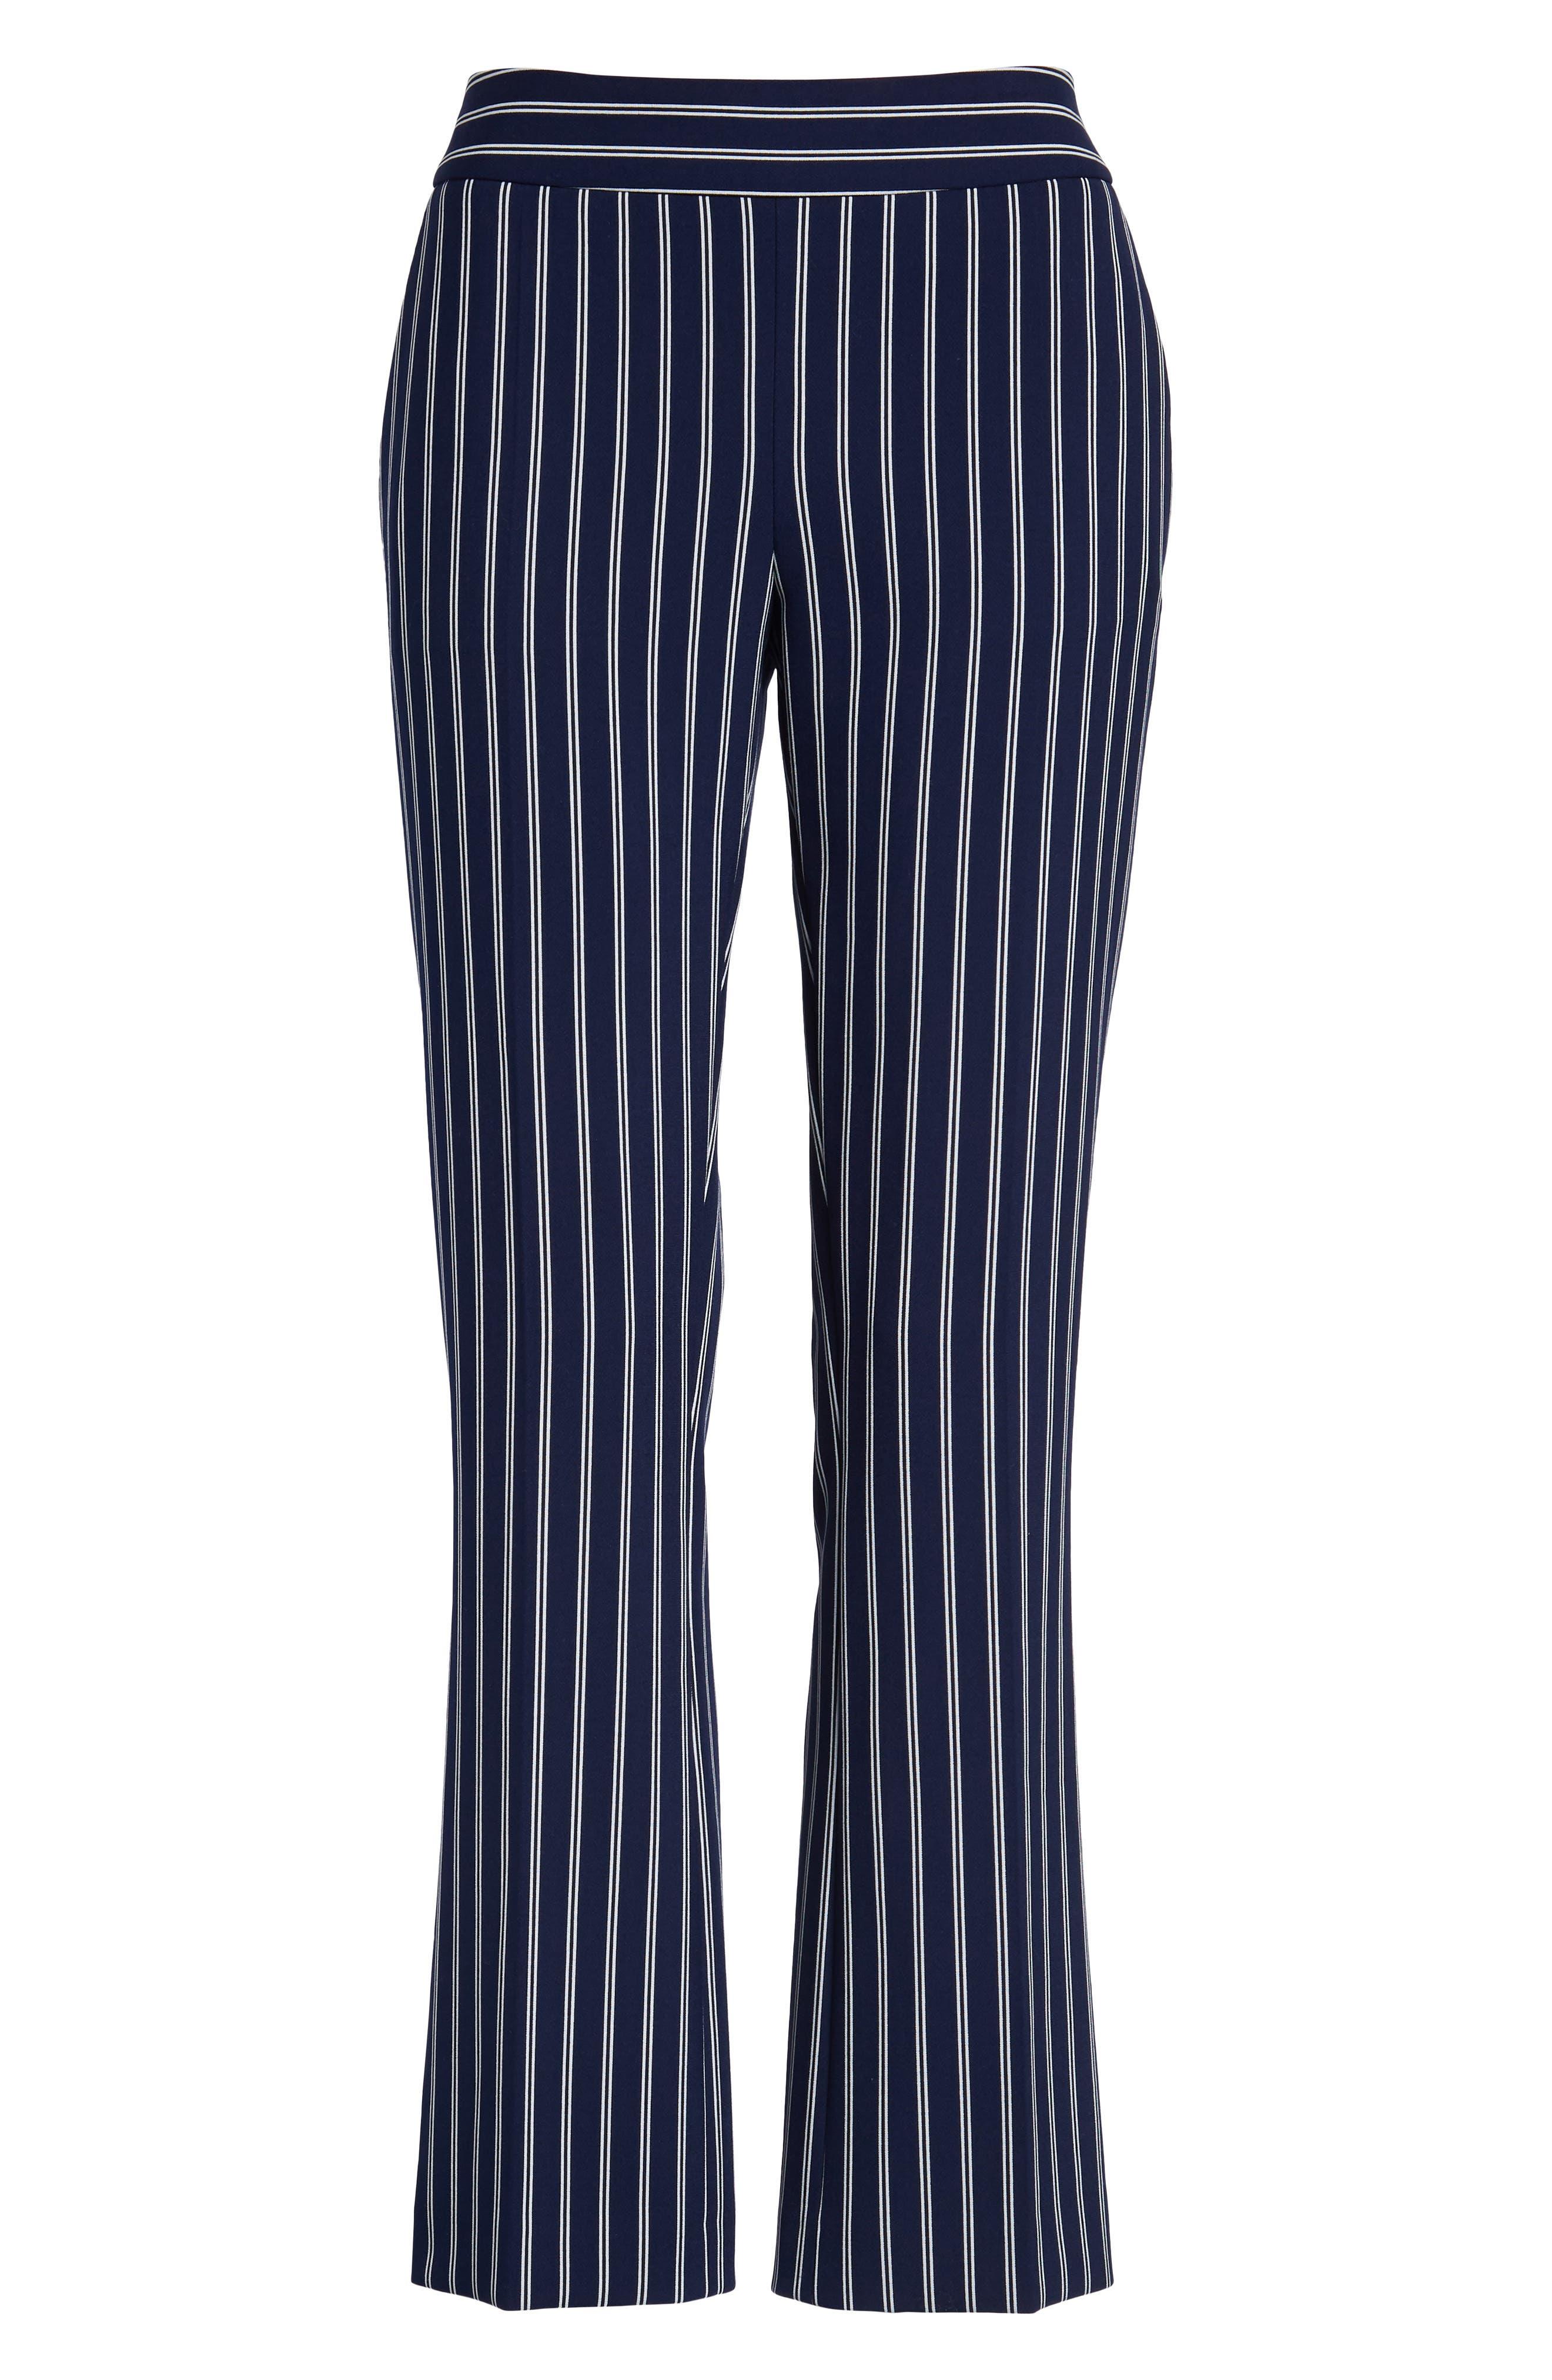 Tebella Stripe Pants,                             Alternate thumbnail 7, color,                             Blue Fantasy